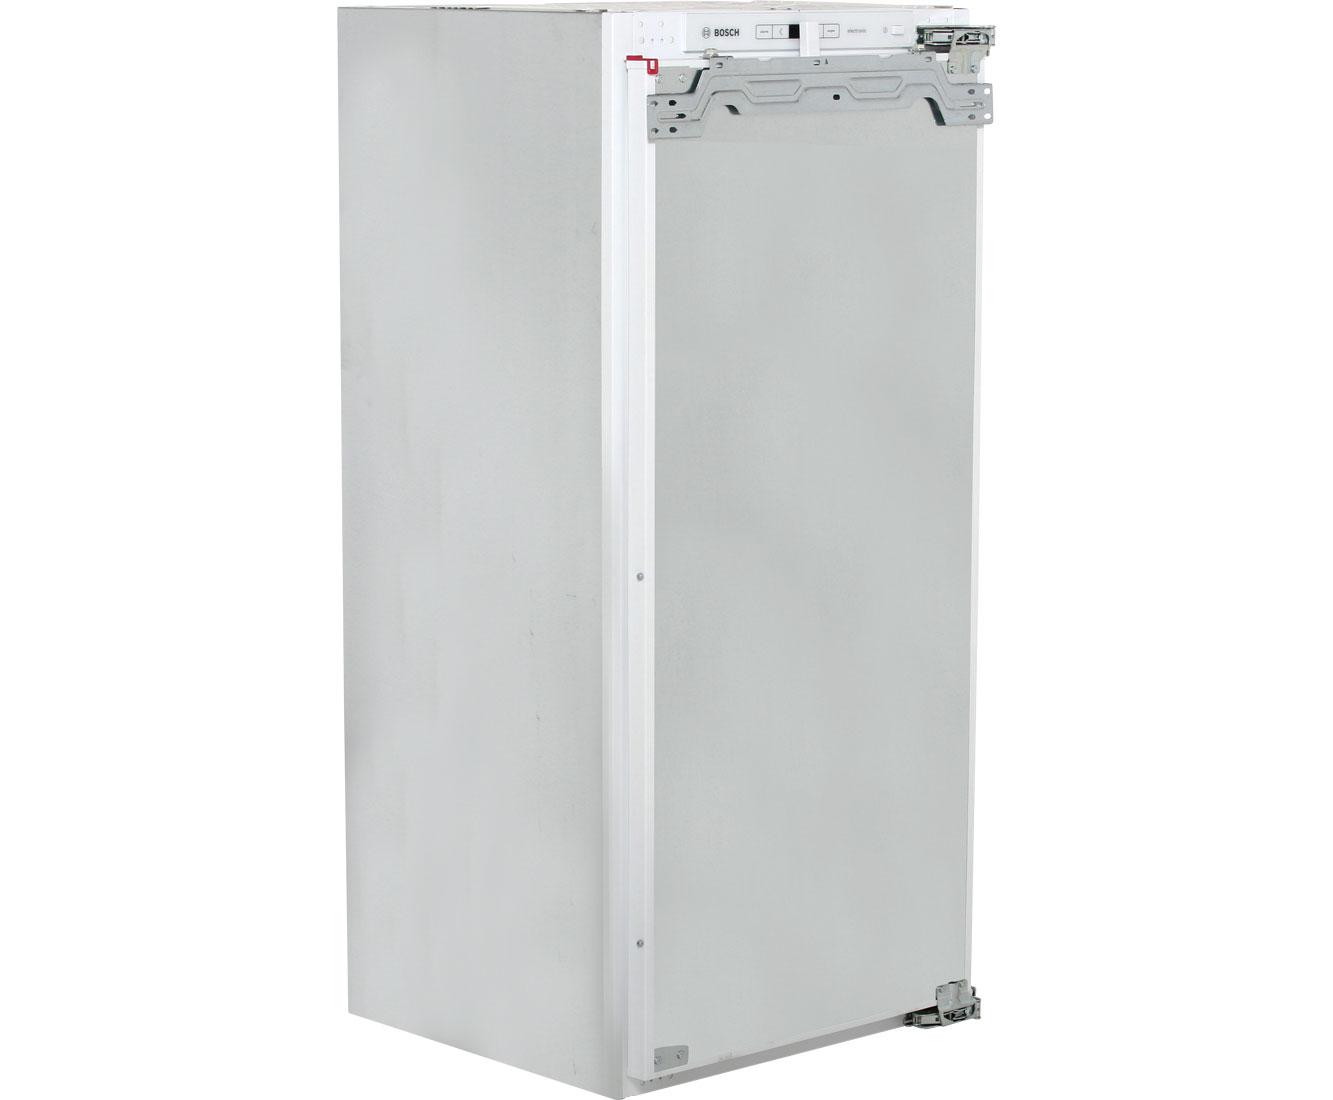 Bosch Kühlschrank Serie 6 : Bosch serie kir af einbau kühlschrank er nische festtür